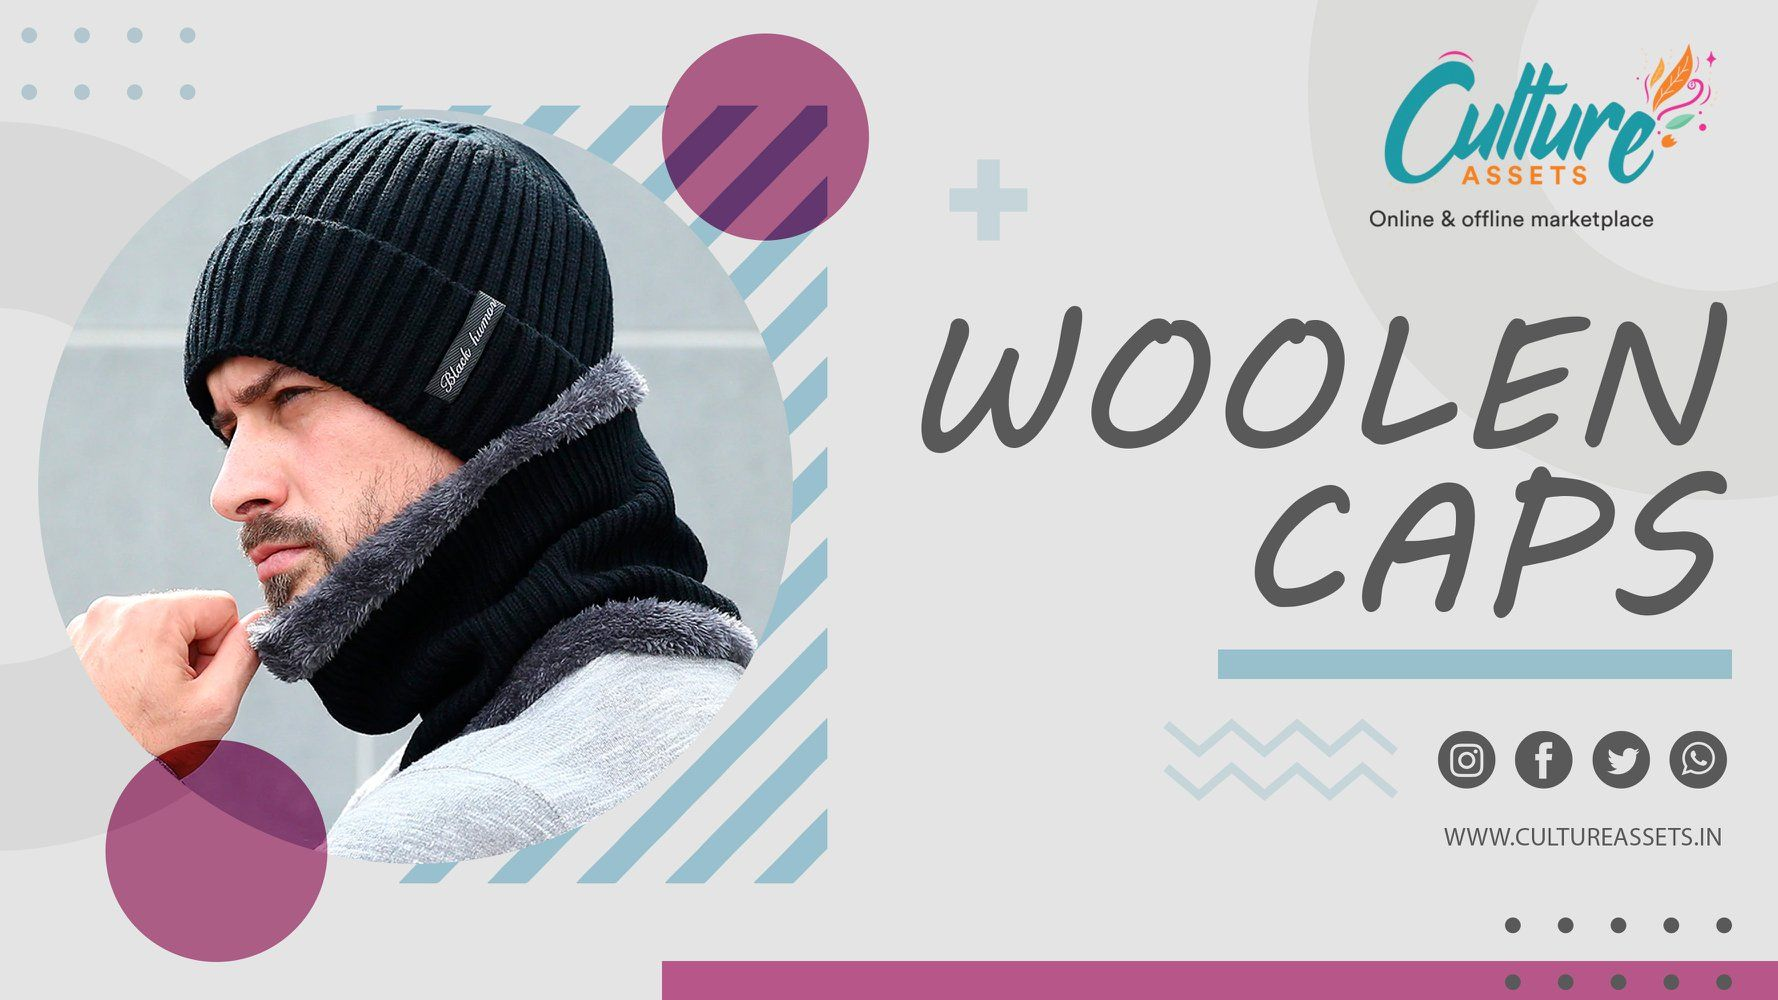 Shop Warm and Cozy woolen caps online on Culture Assets. . . . . #beanies #beanie #hats #beanieseason #fashion #beaniehat #handmade #m #hoodies #streetwear #clothing #dadhats #caps #snapback #beaniehatmurah #winter #crochet #snapbacks #kupluk #tshirts #hat #headwear #beaniemurah #beanieboos #beaniehats #embroidery #beaniestyle #apparel #beaniepolos